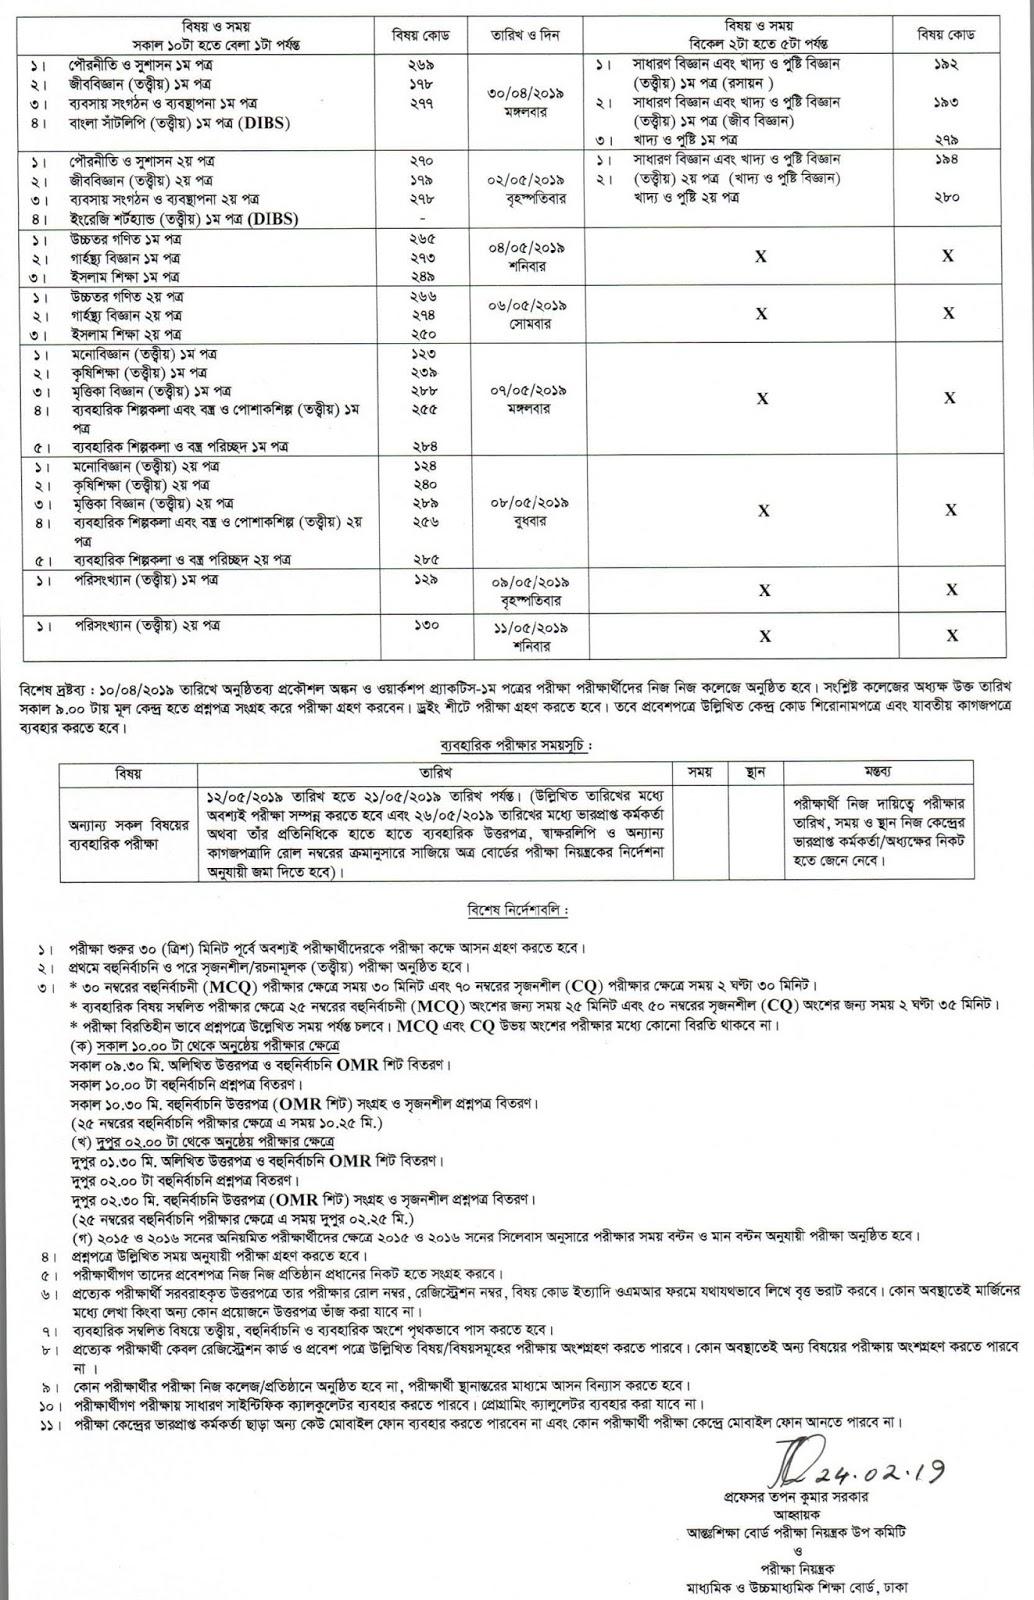 HSC-Exam-Routine-2019-Starts-1-April-DIBS-Dhaka-Comilla-Rajshahi-Jessore-Chittagong-Barishal-Sylhet-Dinajpur-Board.jpg